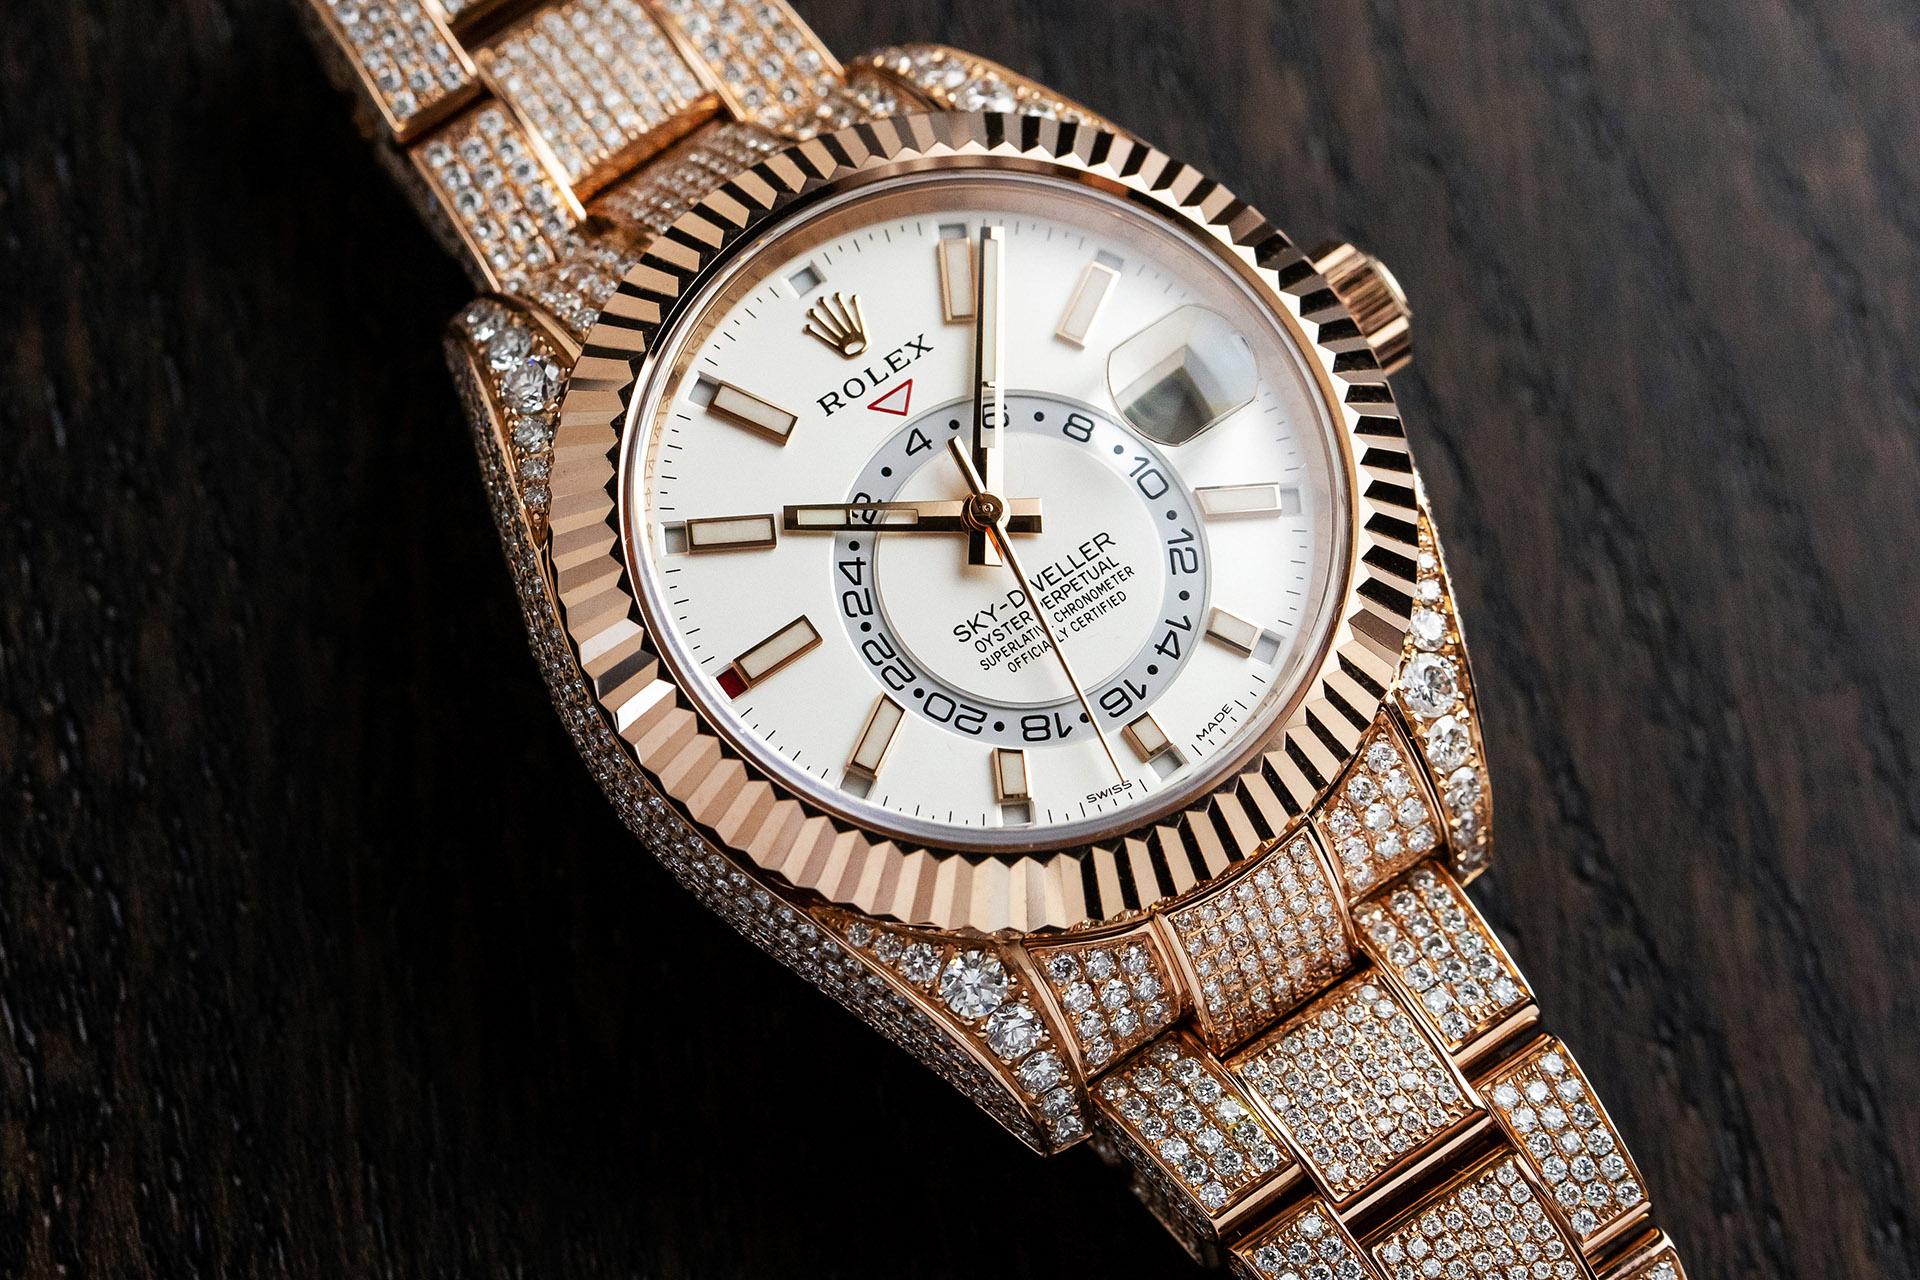 5 Best Rolex Diamond Watches to Buy in 2021